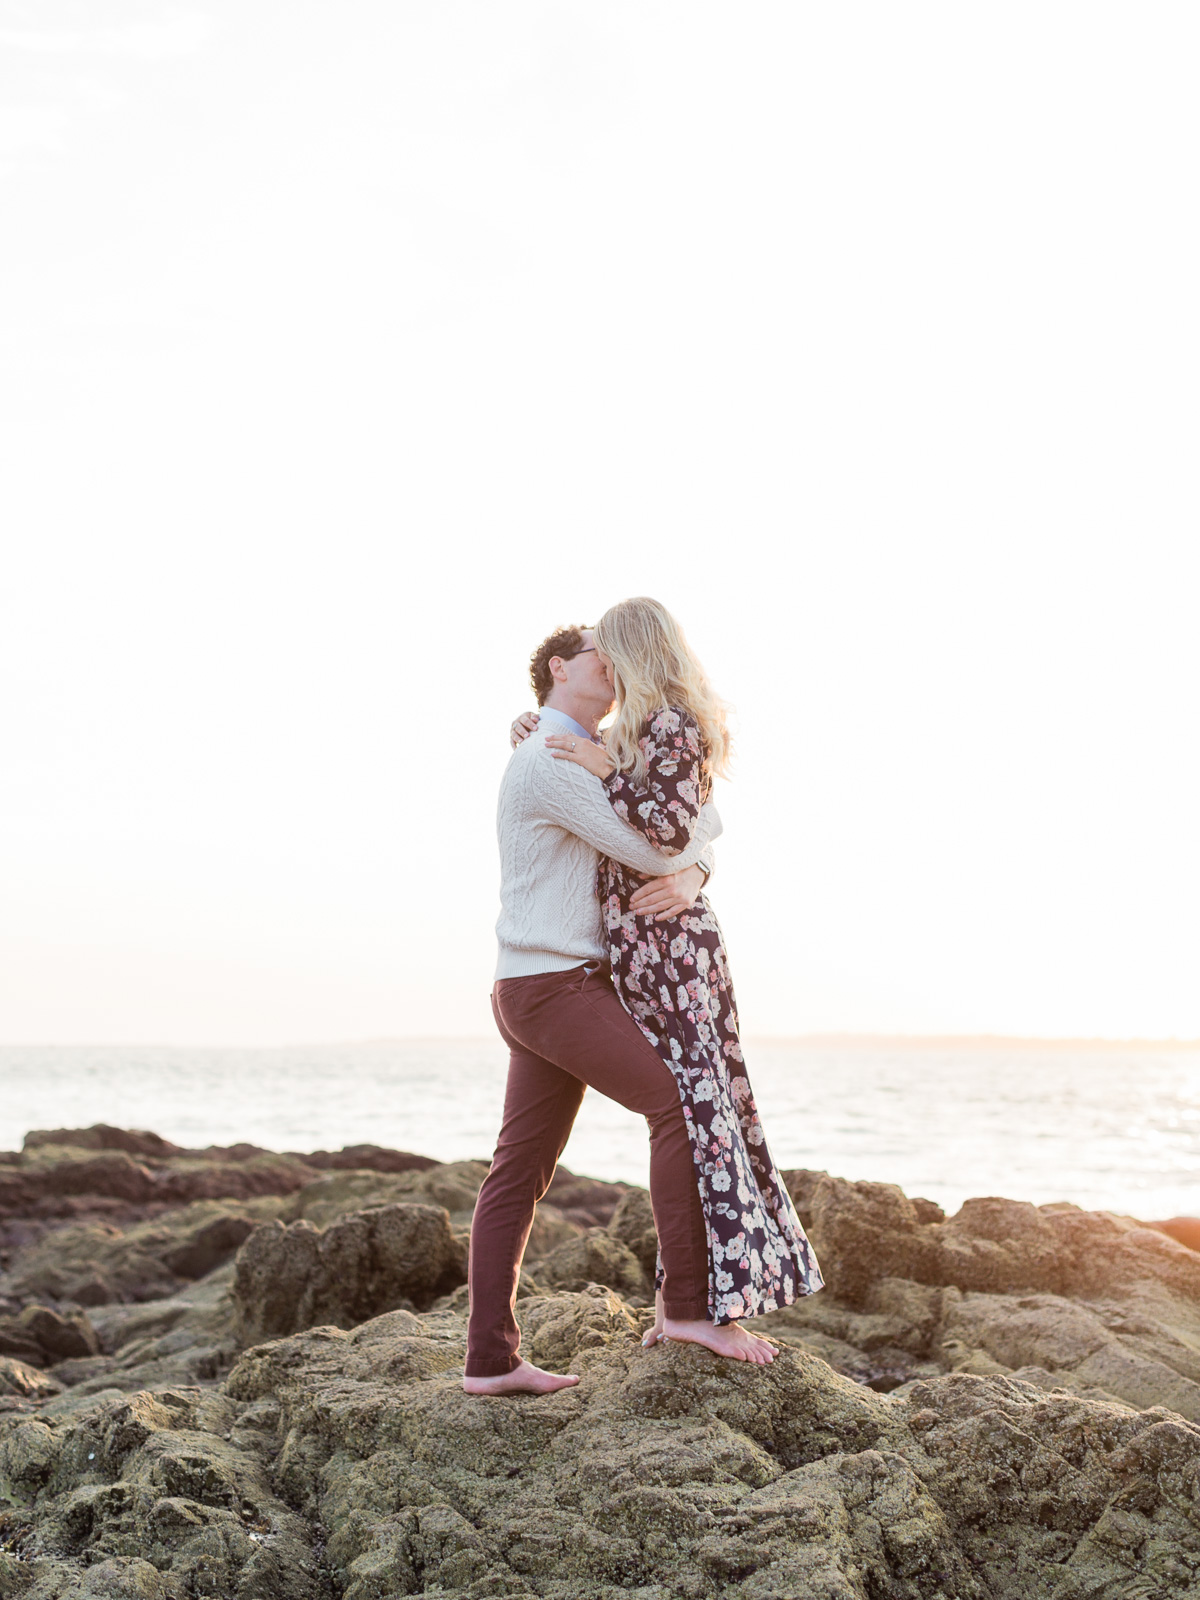 Romantic & Joyful Engagement Photos at Lighthouse Point Park-6.jpg